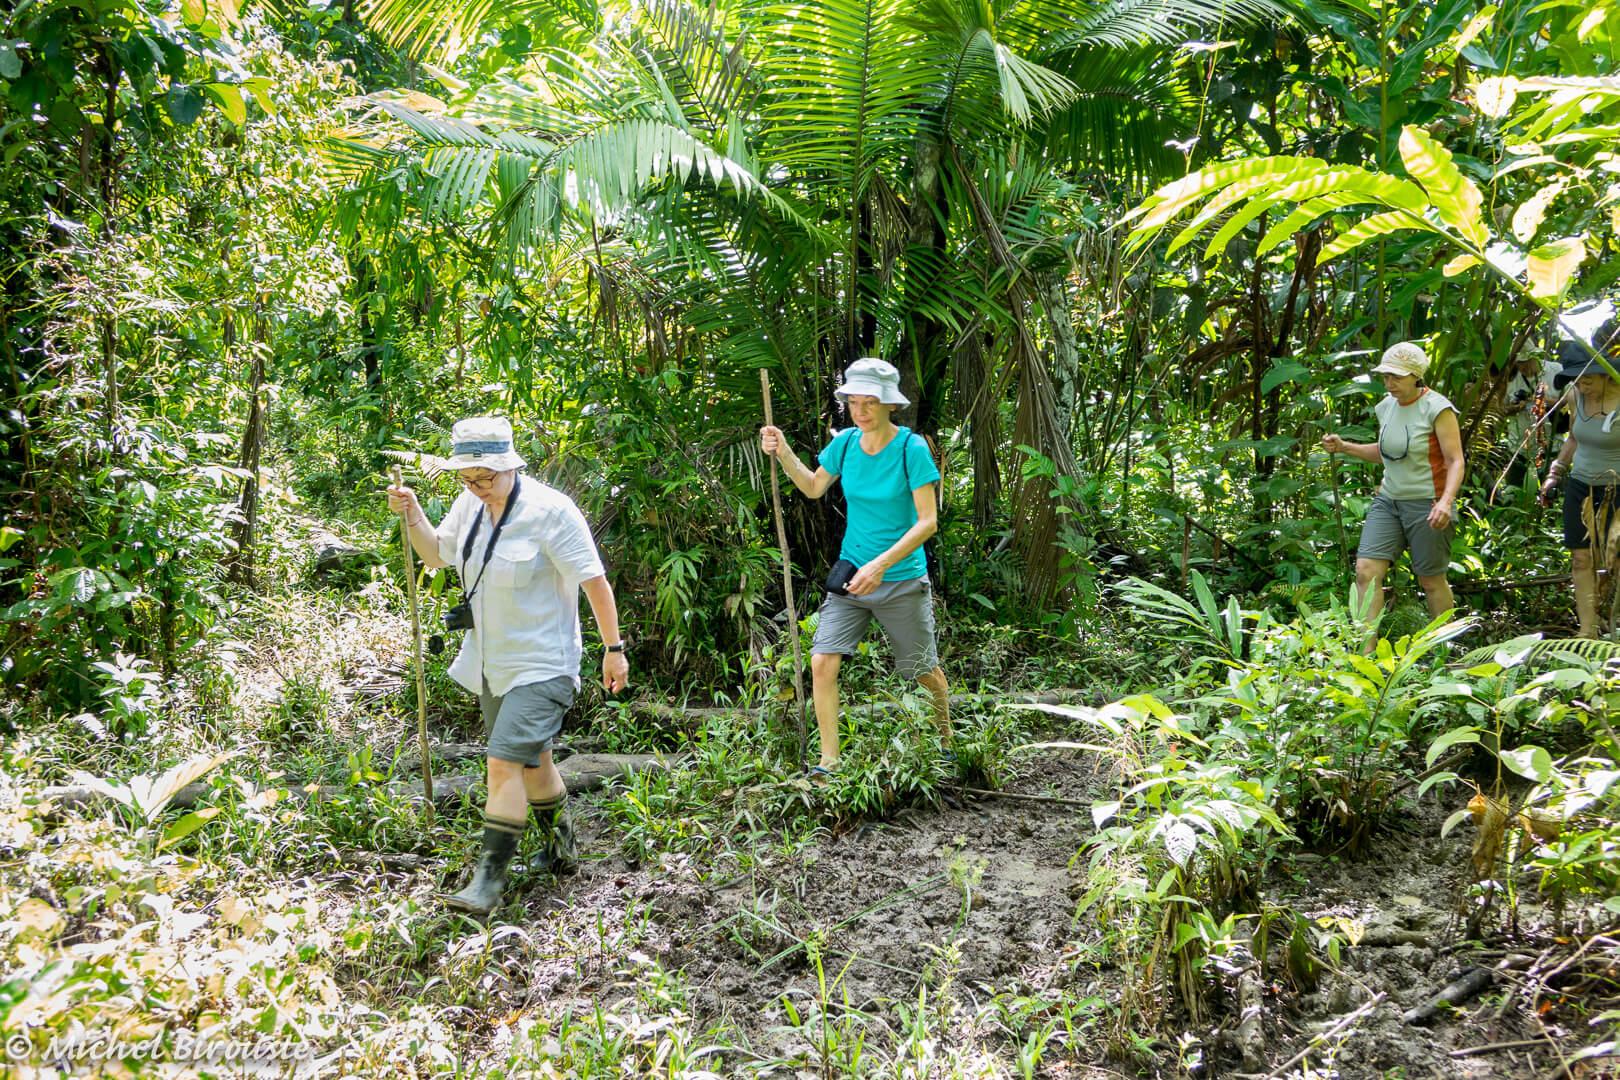 Indonesie-randonnee-balade-jungle-nature